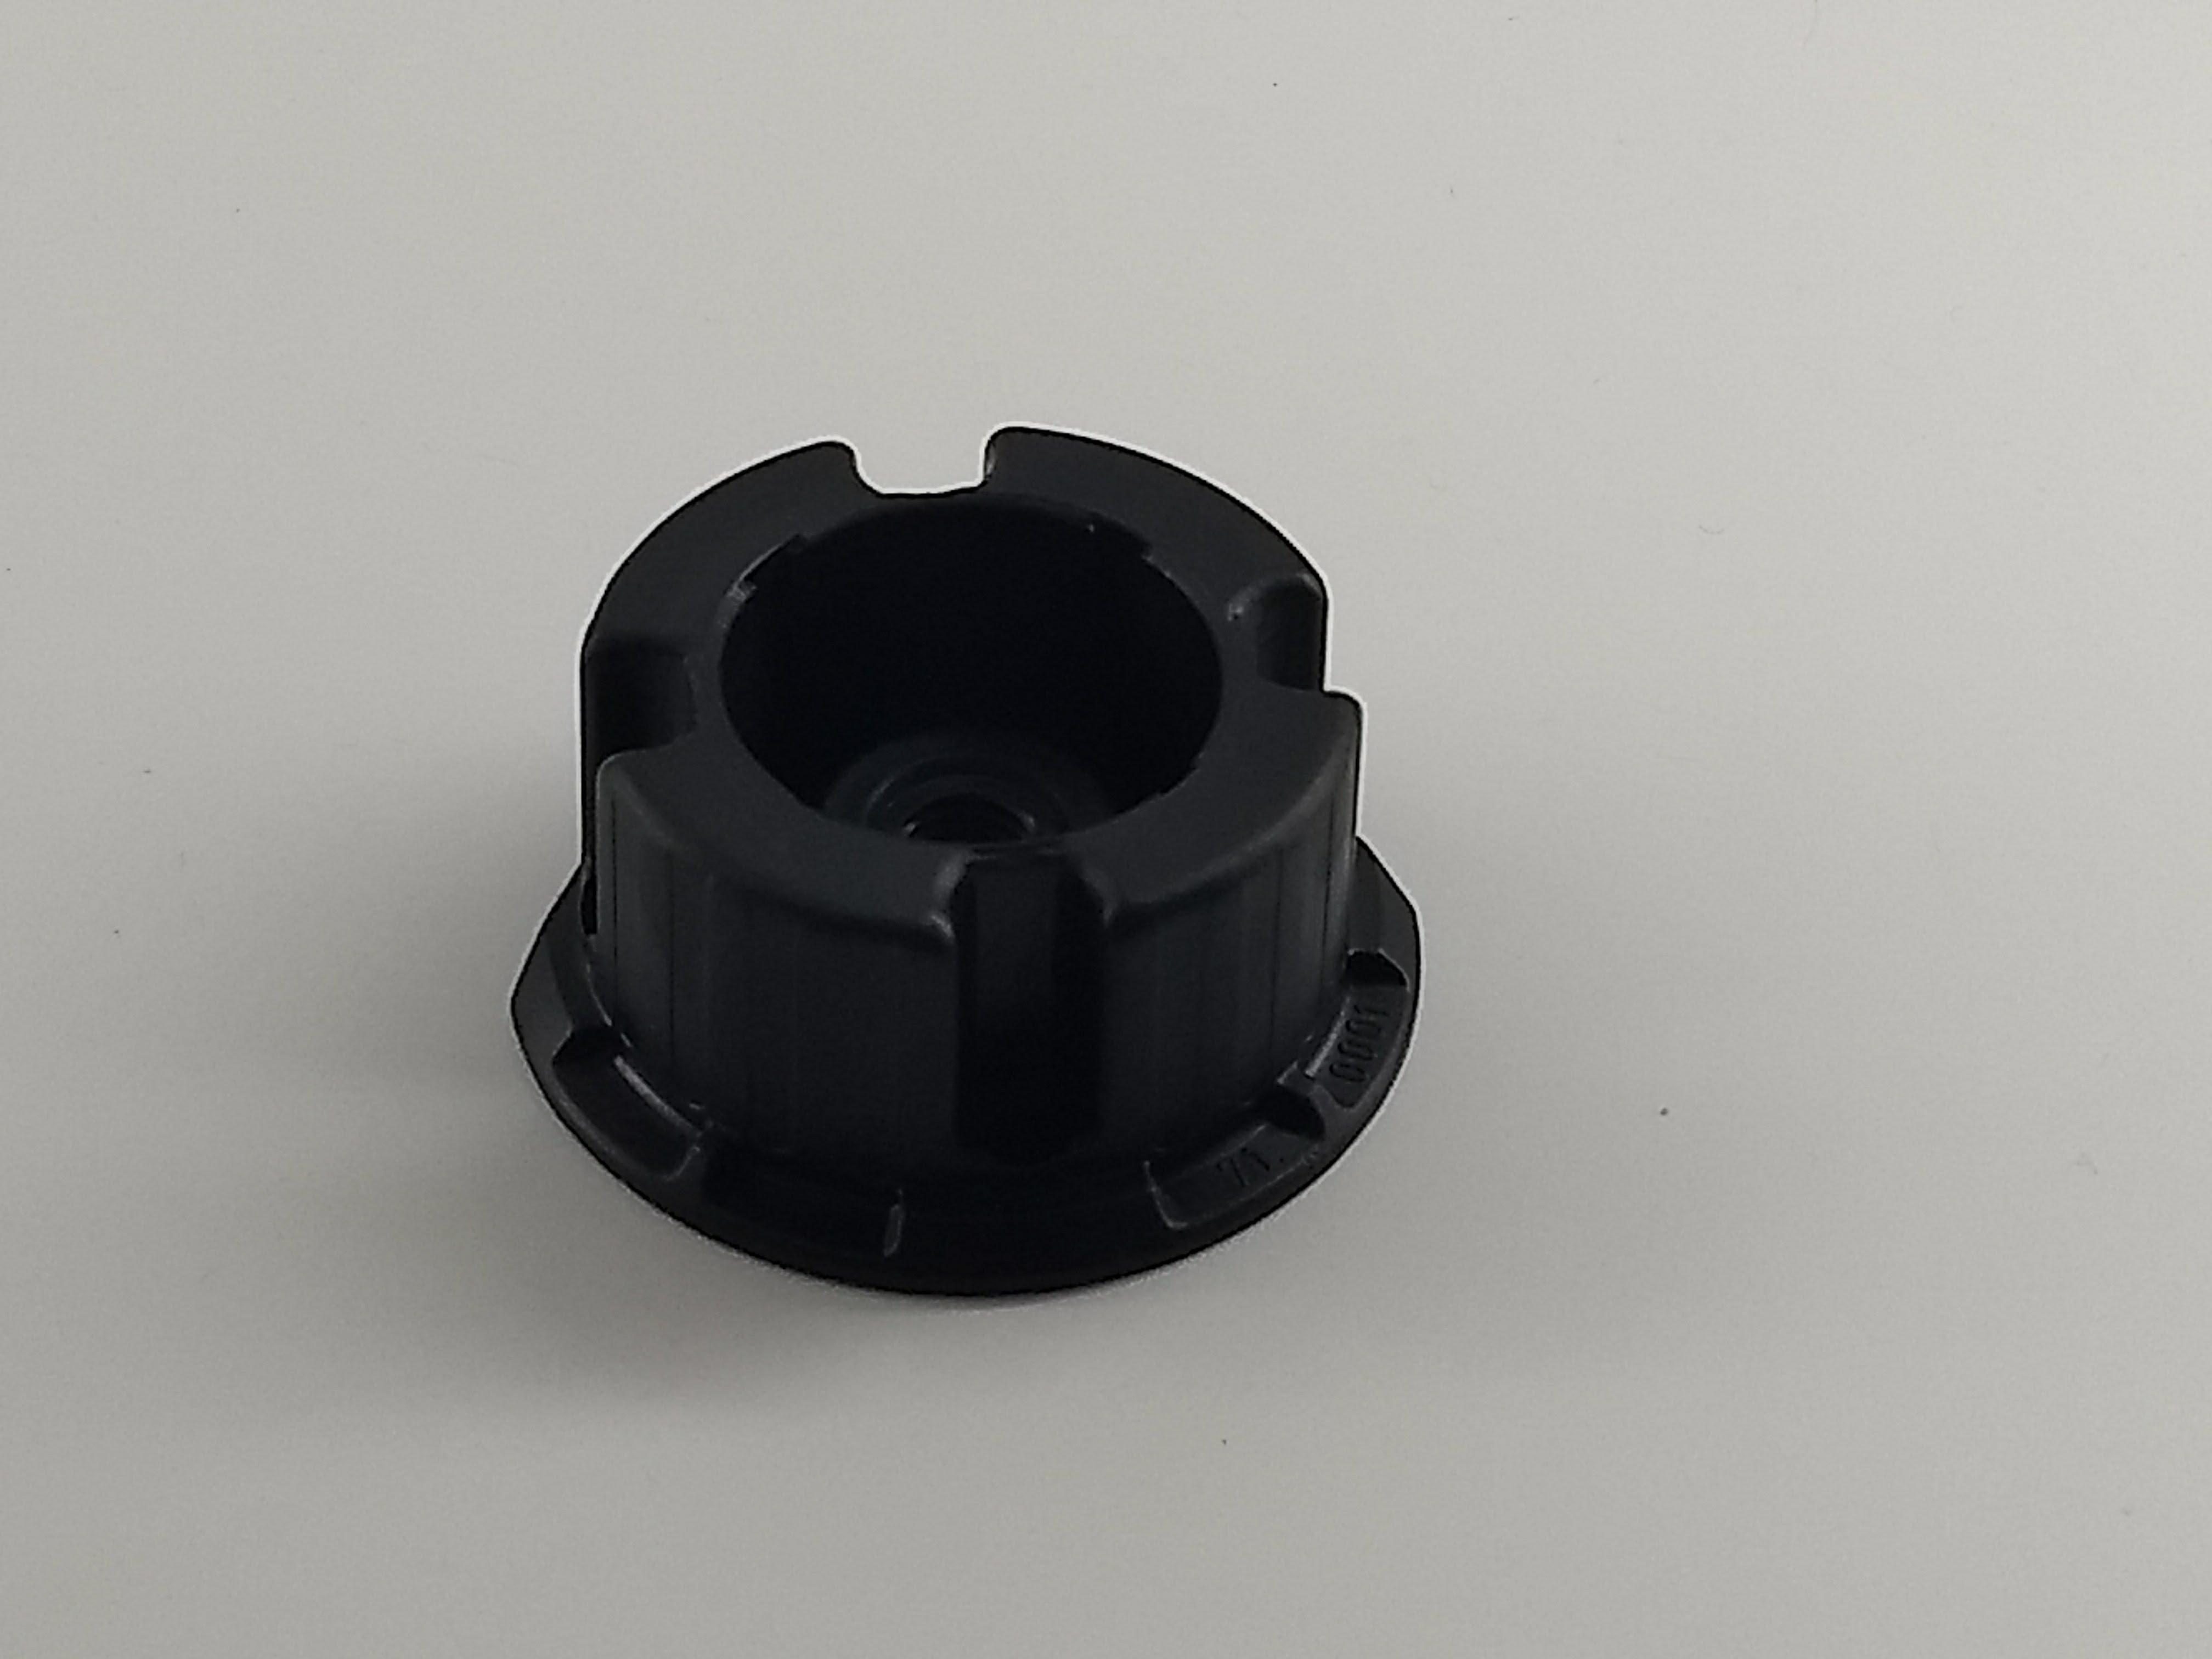 Set 4 Stück - 4 er Set Sockelfuss Möbelfuss Stellfuss Verstellbar für Sockelleiste 120mm - 150mm - i